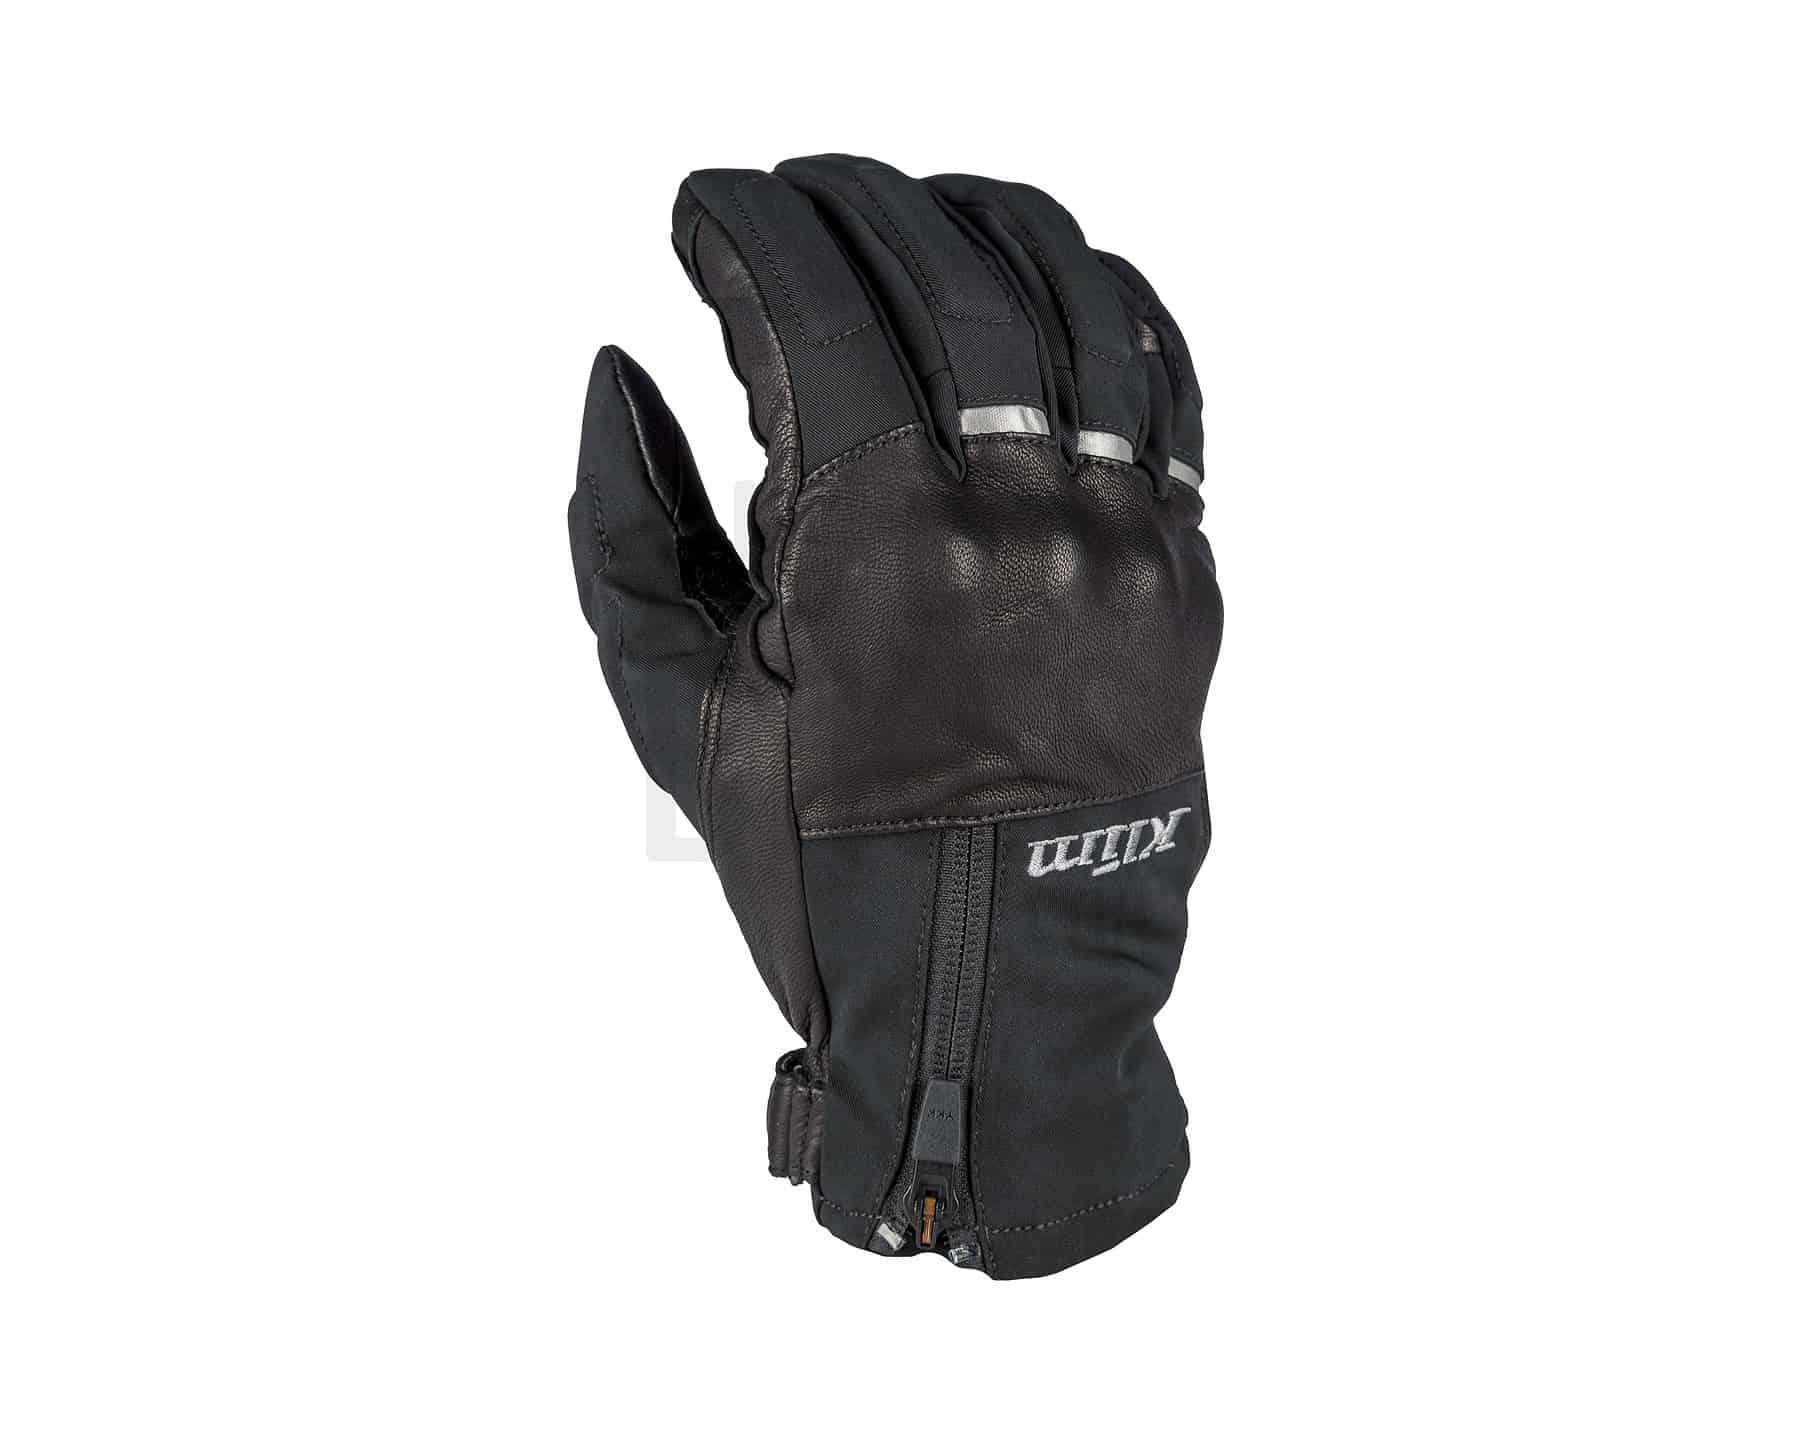 Vanguard GTX Short Glove_3922-000_Black_01